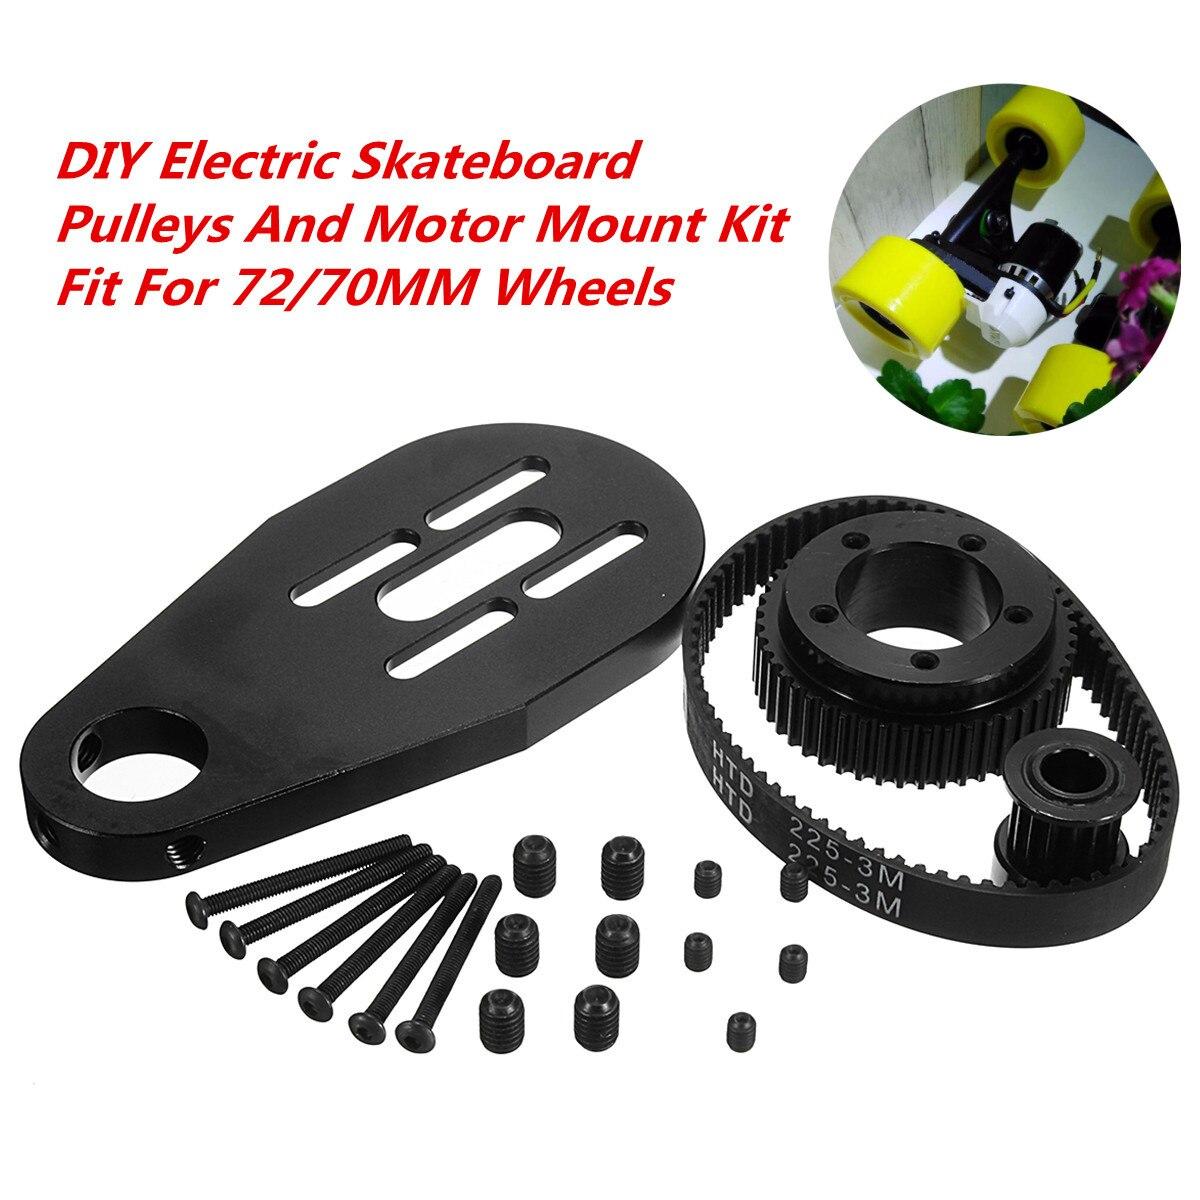 Kit de monopatín eléctrico DIY piezas poleas + montura de Motor + correa para polea de patín de 72mm 70